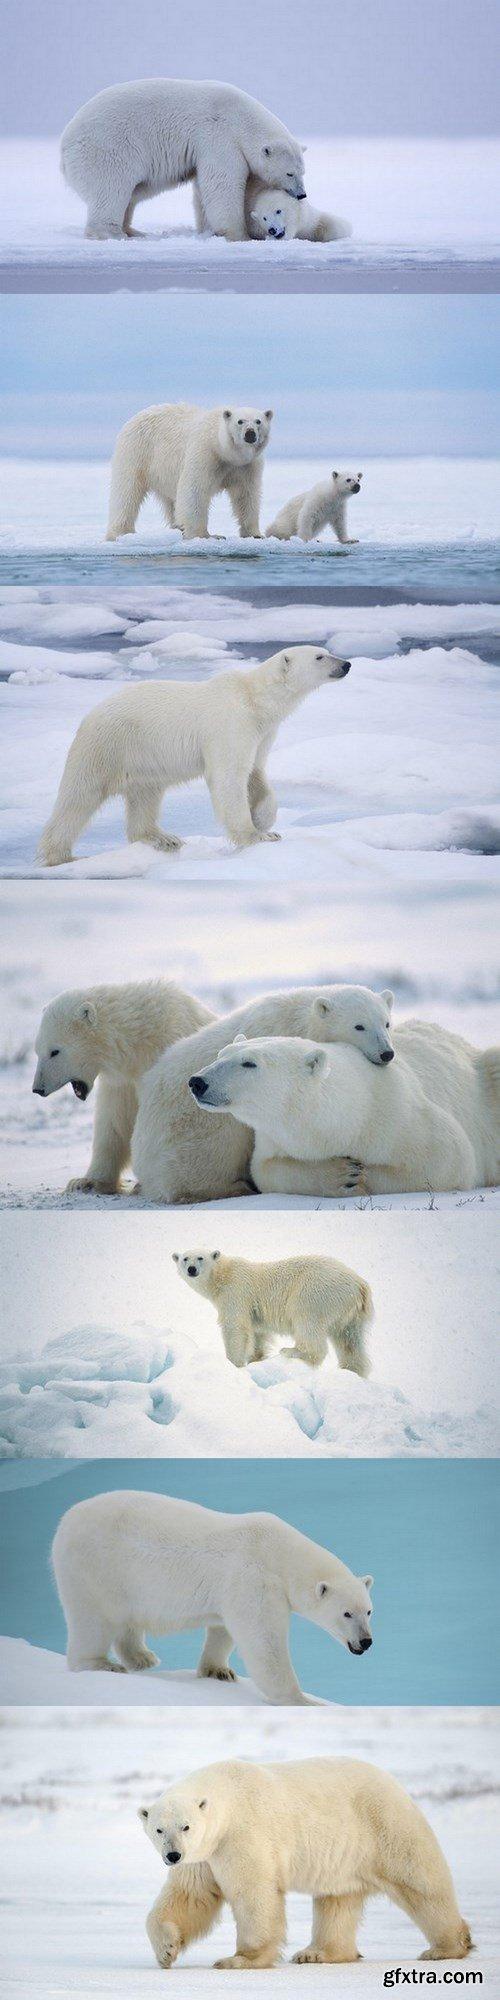 Polar bear - 7 UHQ JPEG